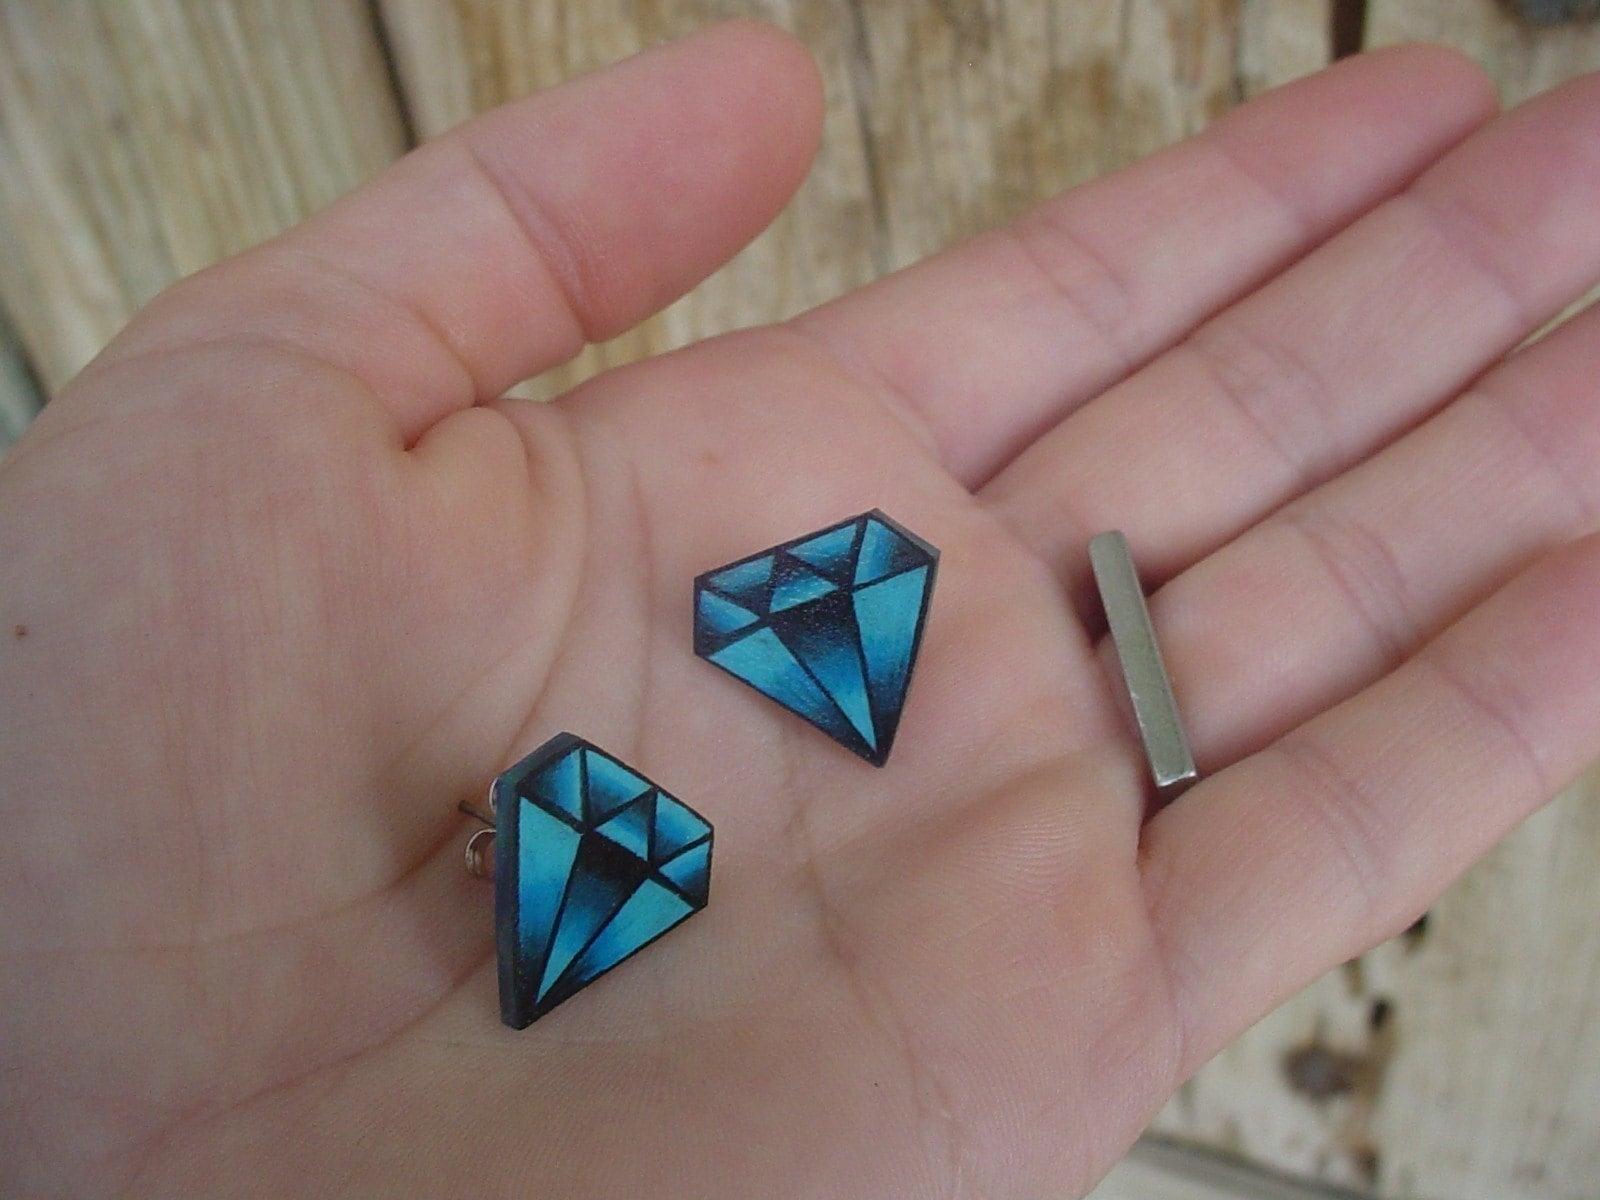 Vintage Tattoo Diamond Earrings (silver plated studs posts) september sapphire  gem birthstone